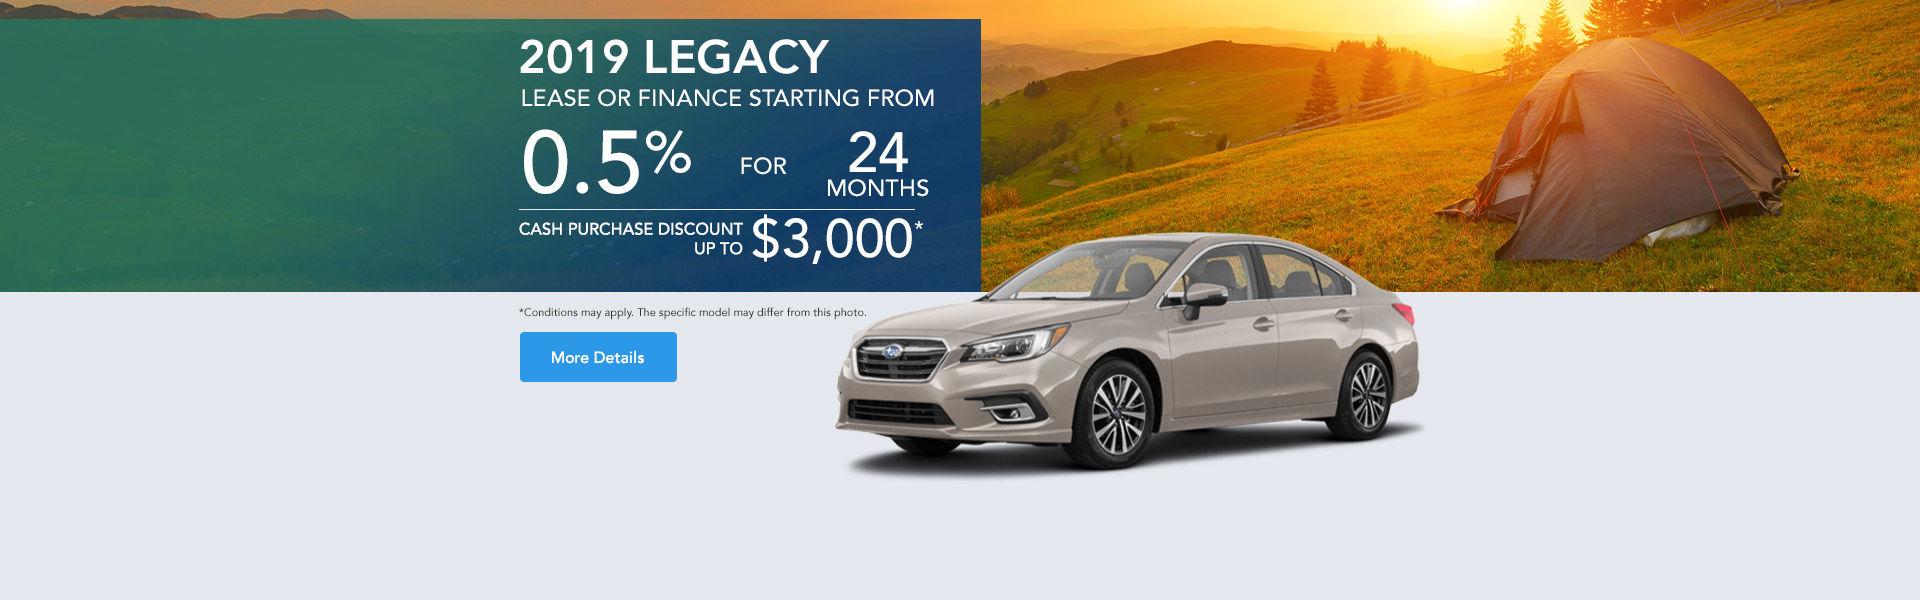 Legacy - header